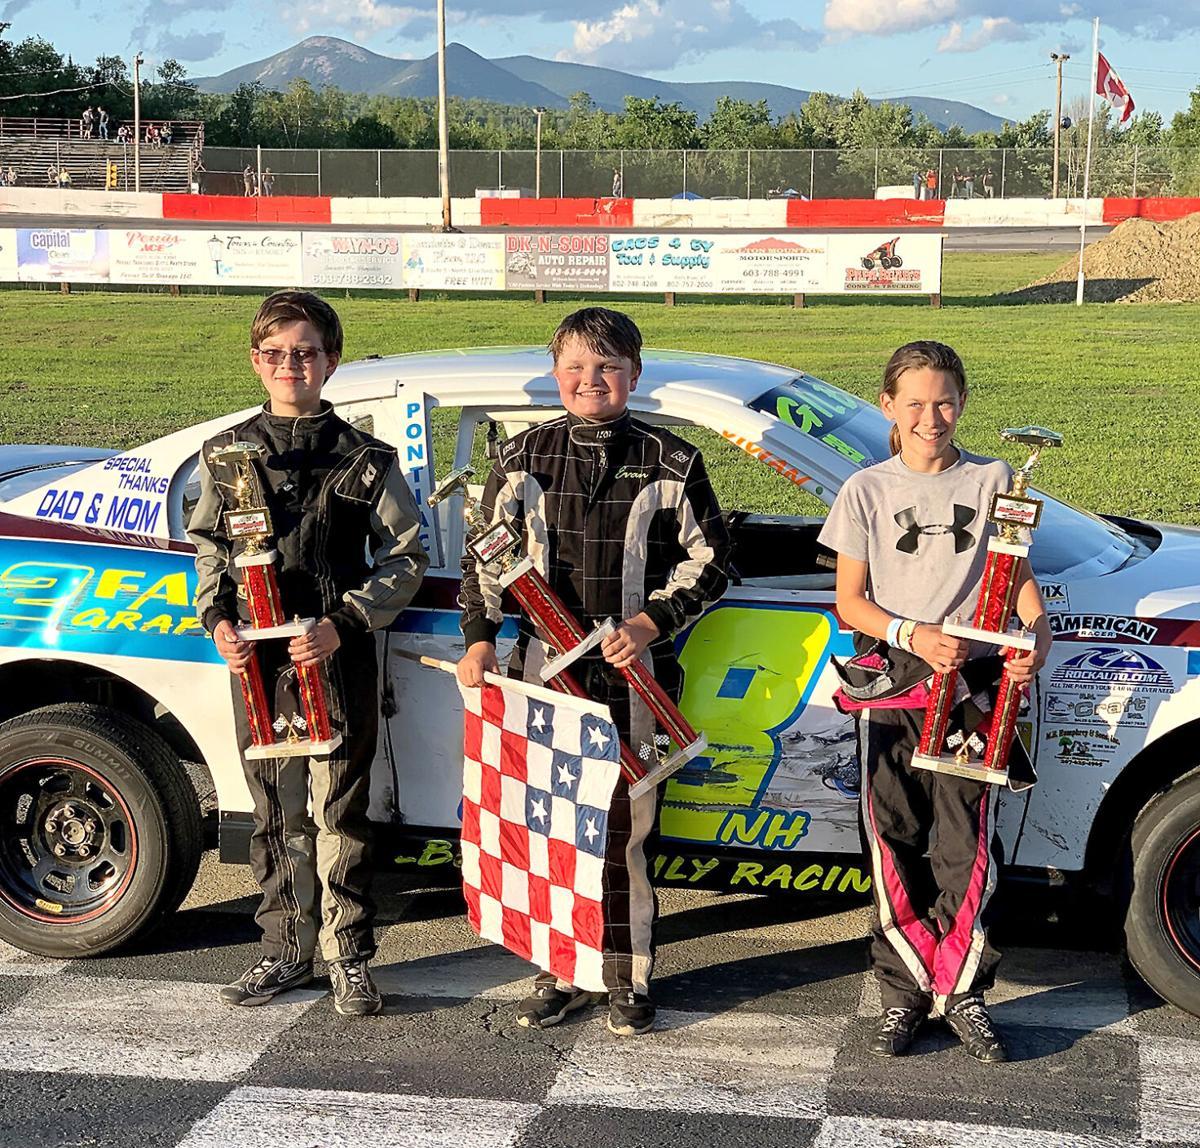 Car Racing - Alexis Lundblad second place in Groveton